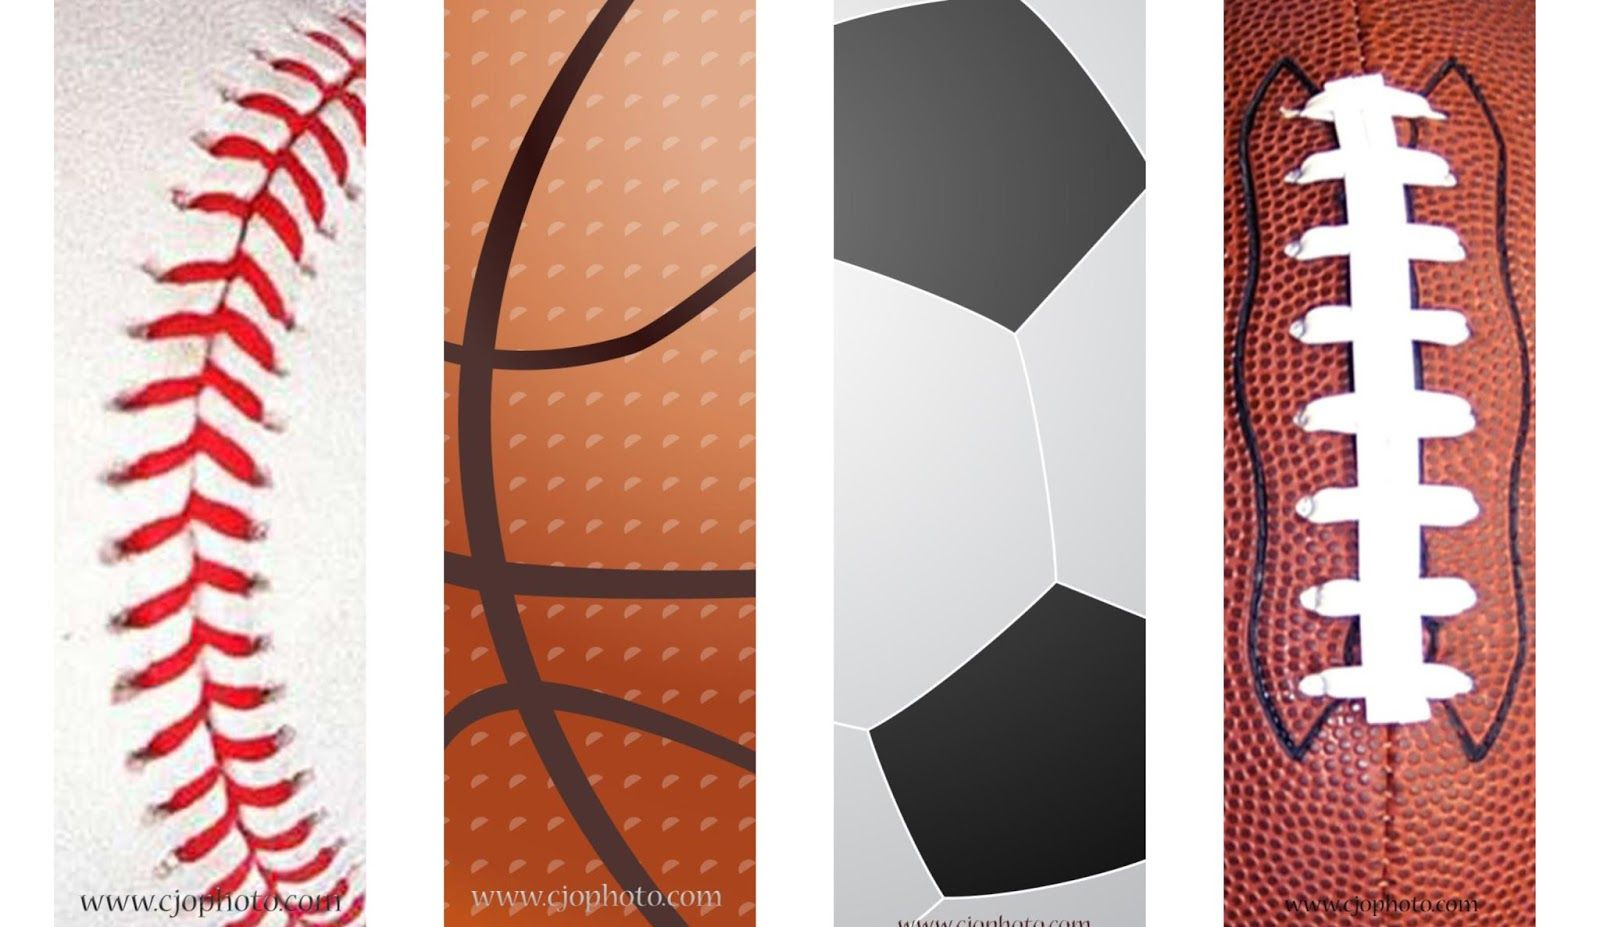 Printable Bookmarks: Sports   Free Printable Bookmarks   Pinterest - Free Printable Sports Bookmarks